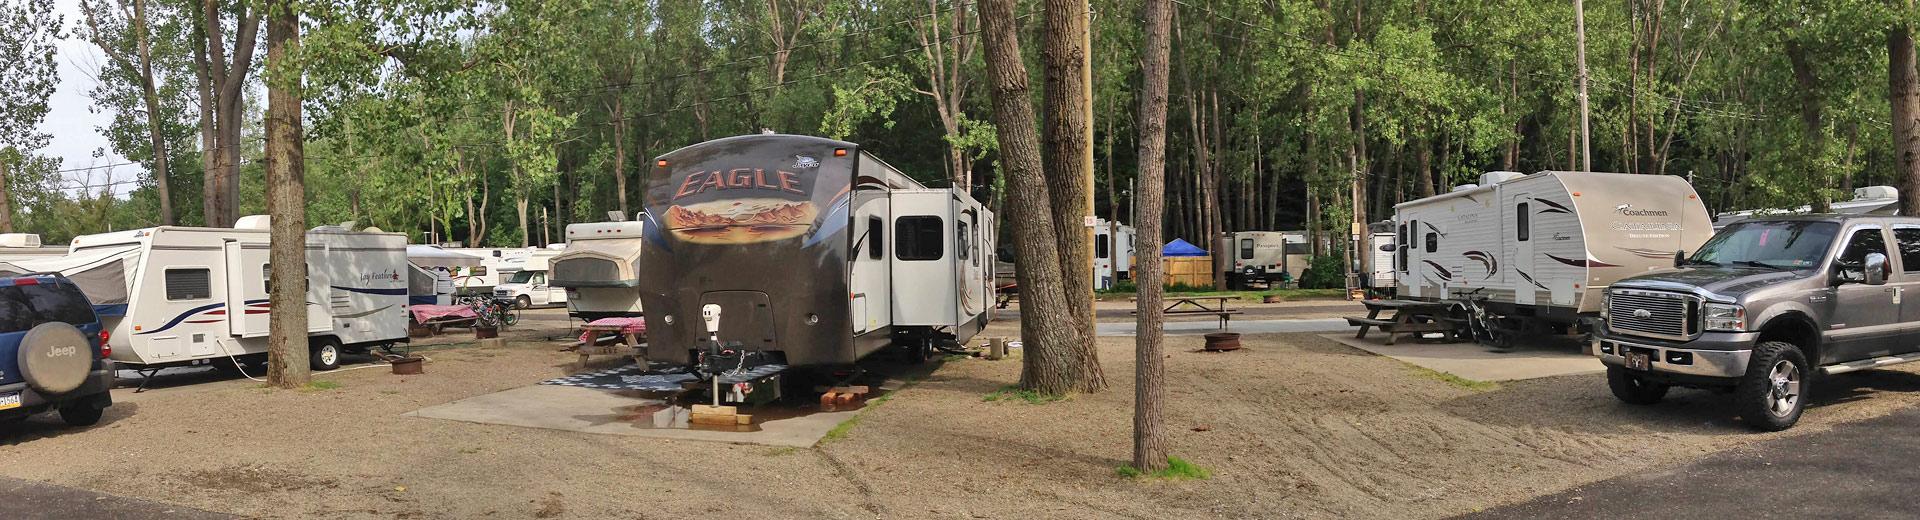 Sara S Campground Family Camping On Lake Erie Pennsylvania